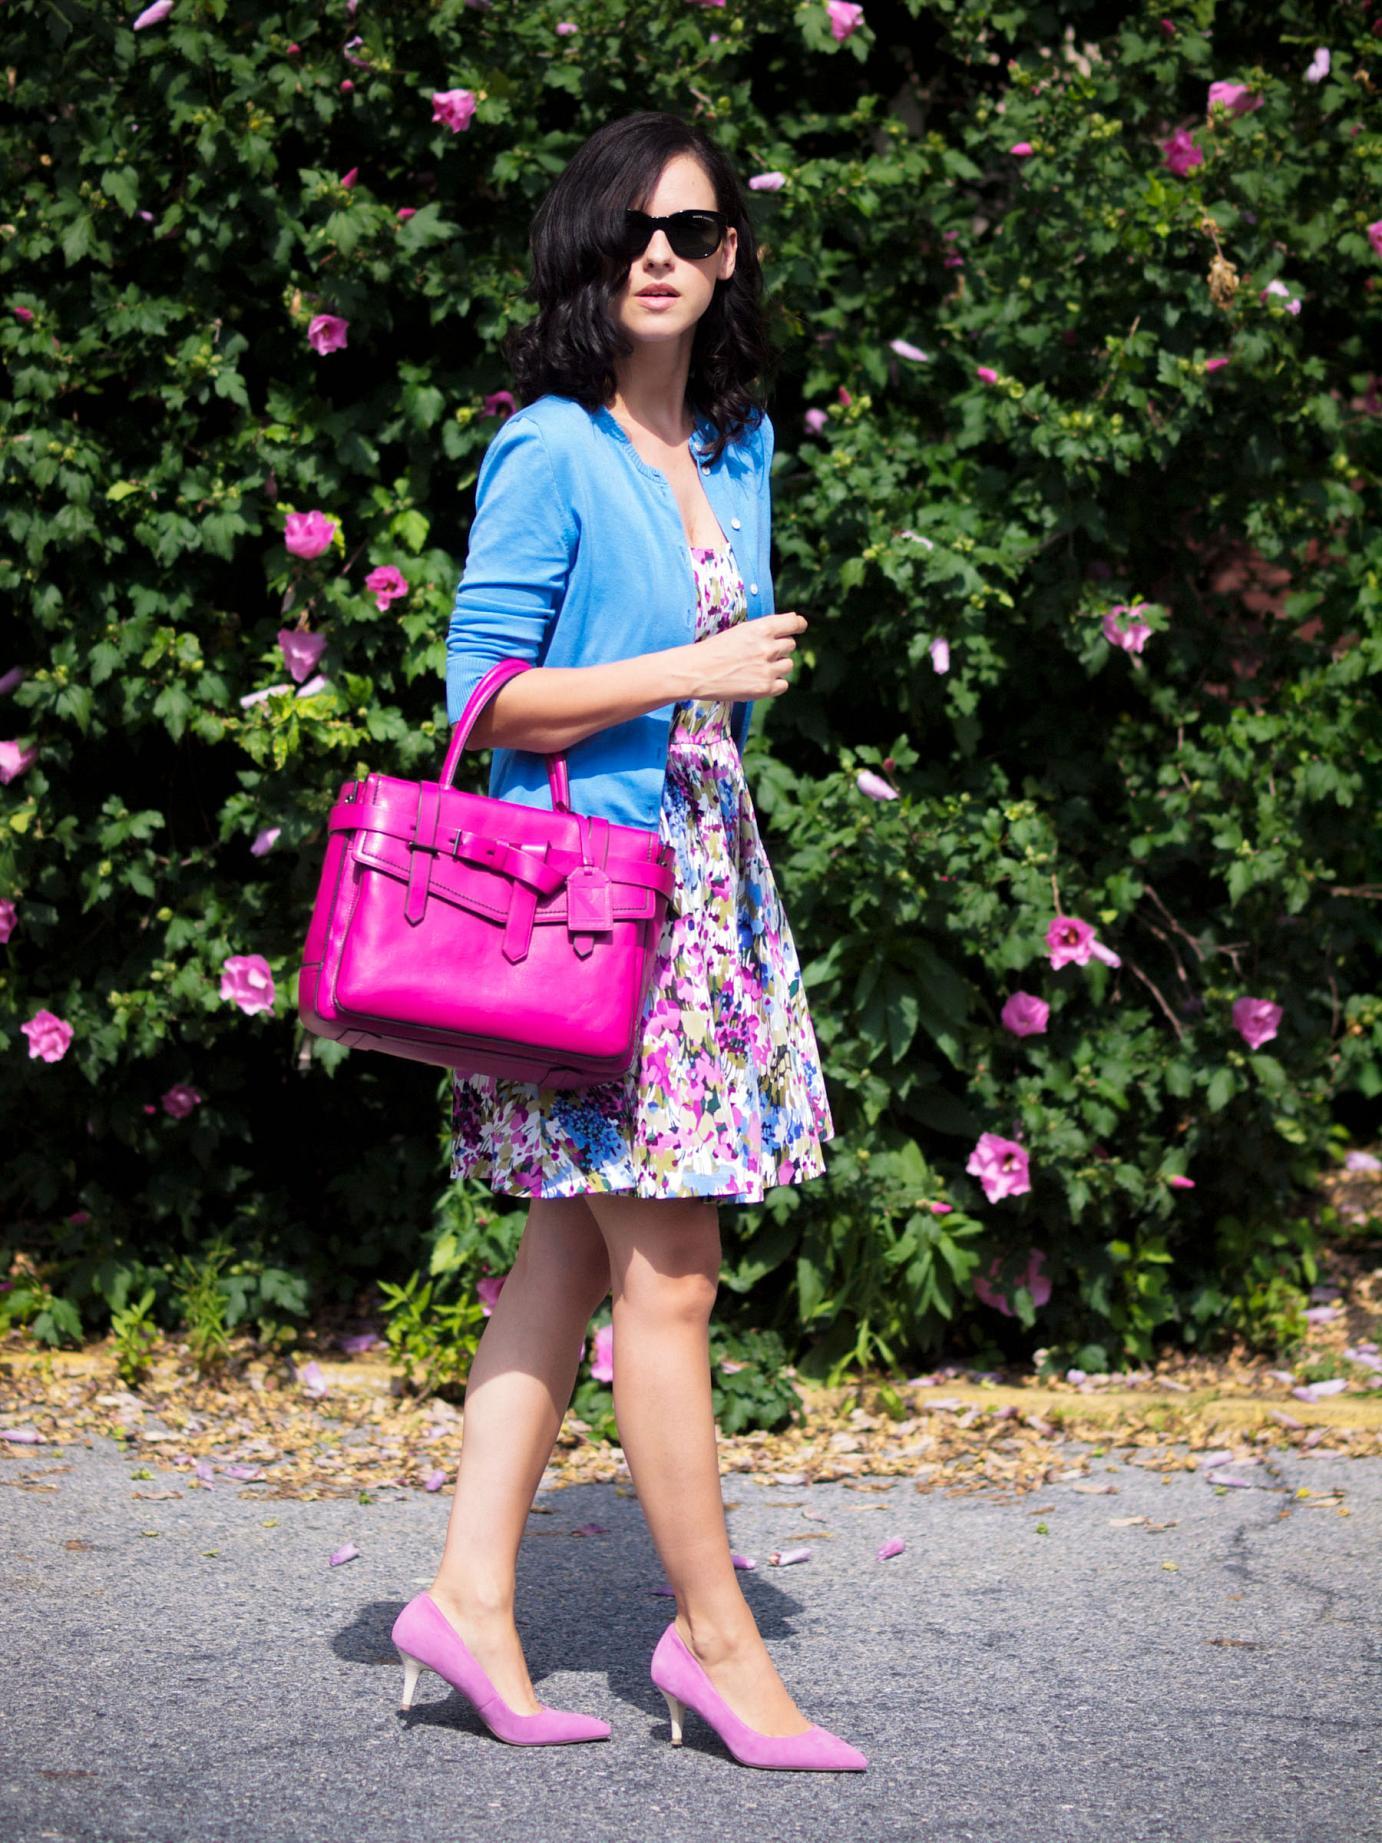 bittersweet colours, floral painted dress, j.crew cardigan, joe fresh, pink pumps, kitten heels, reed krakoff bag, summer dress, street style